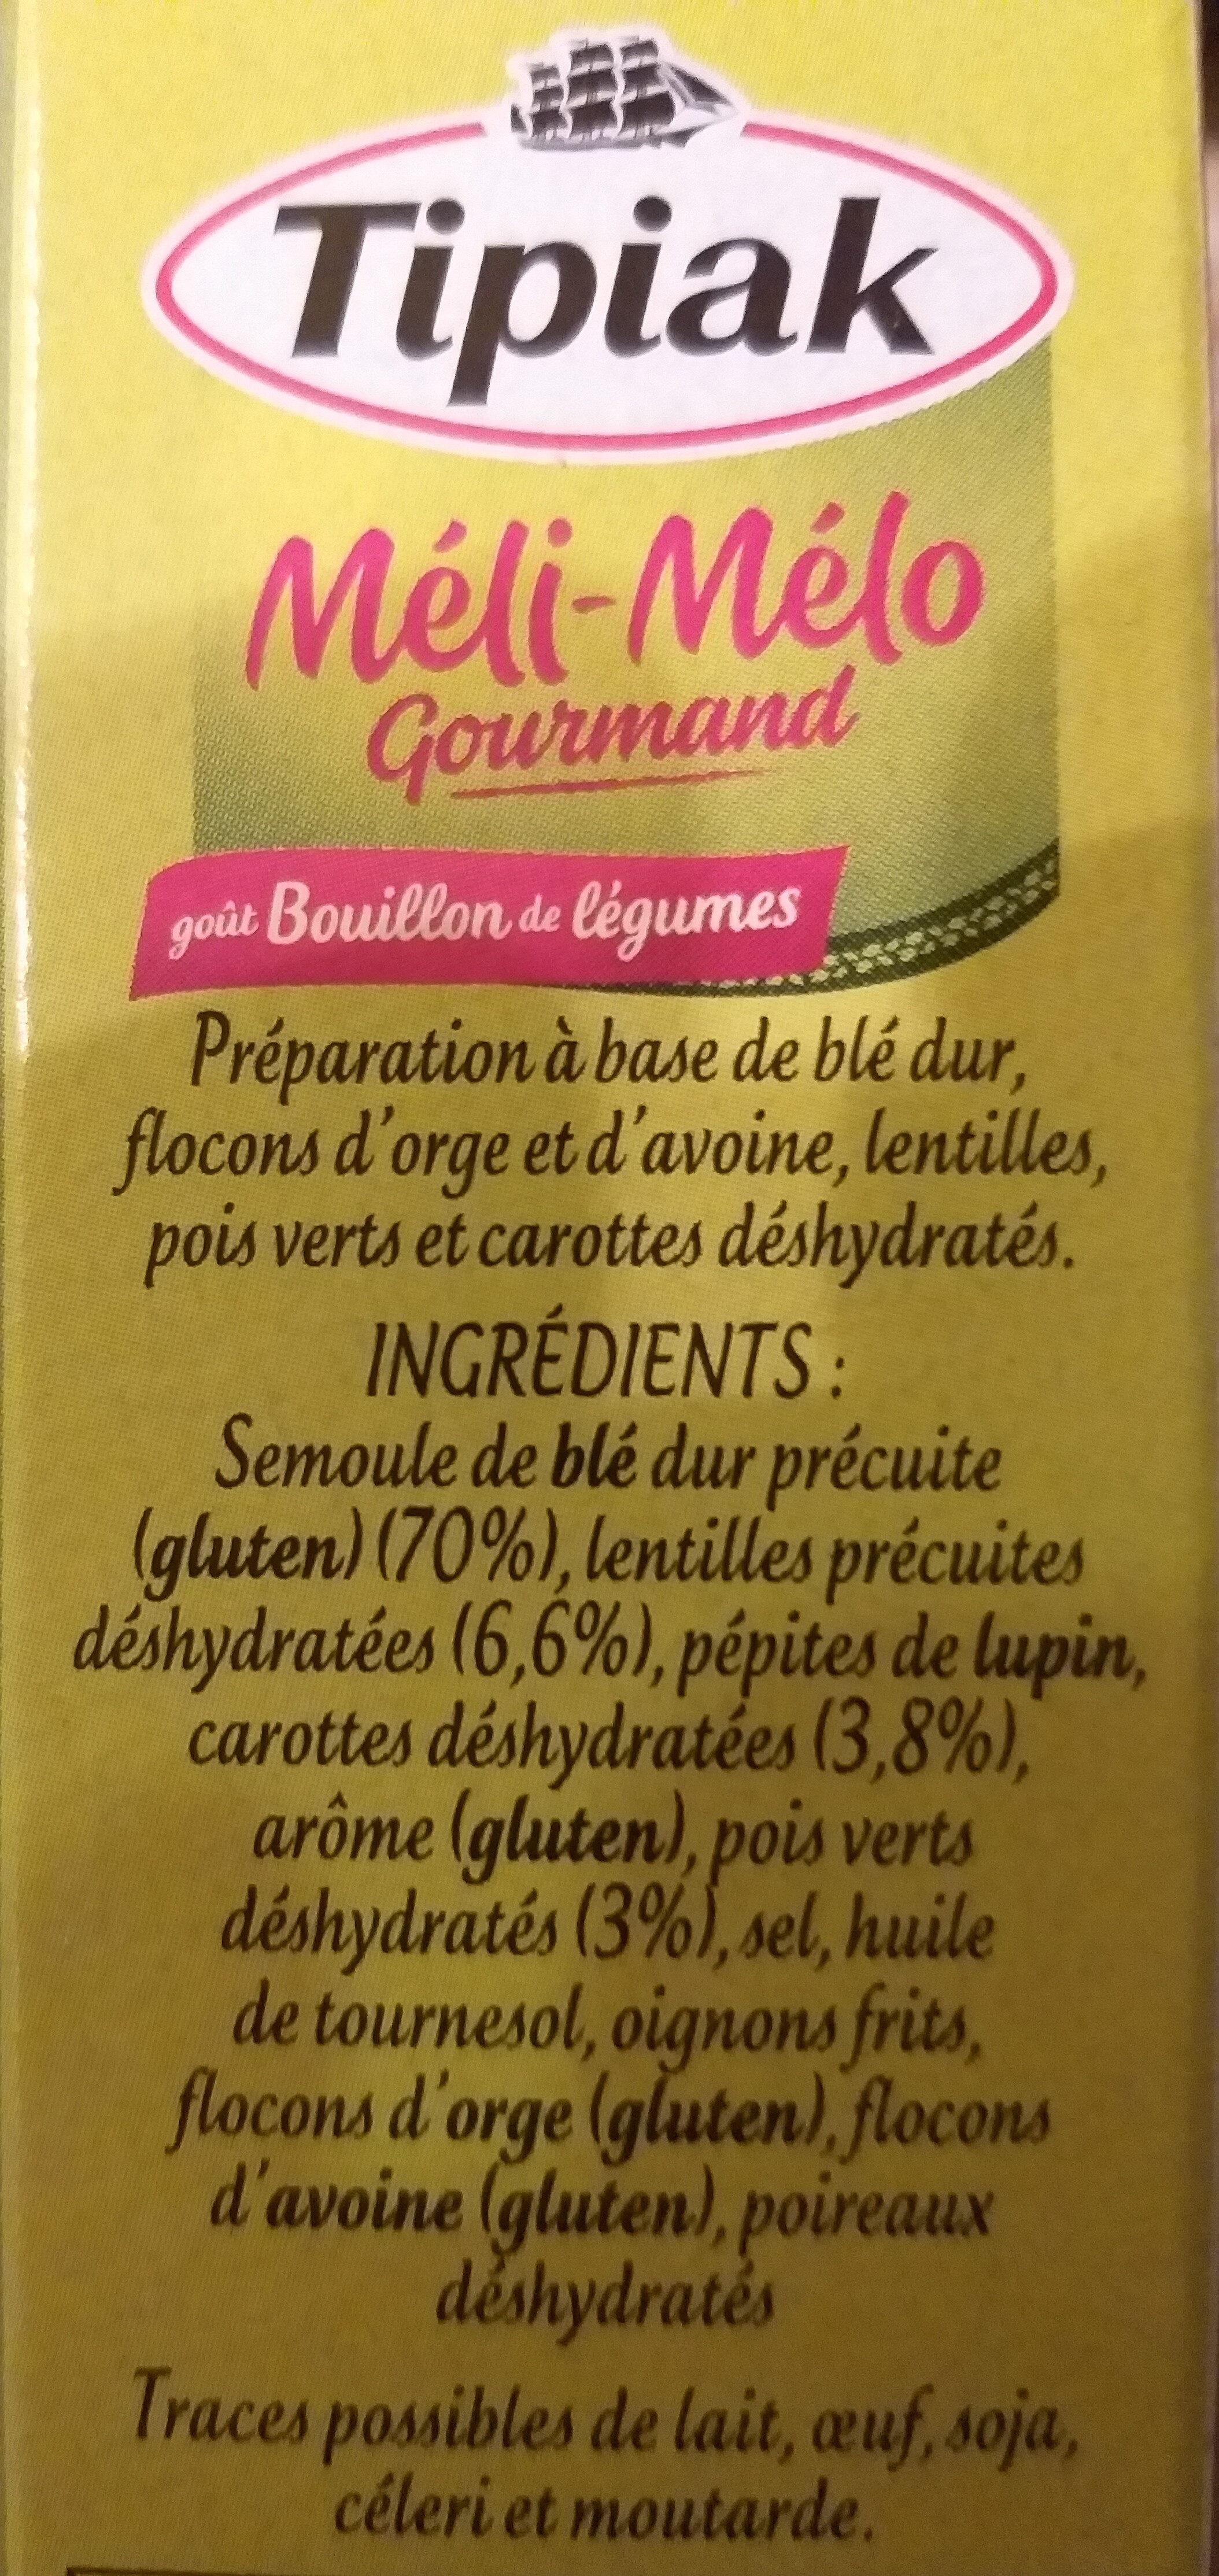 Meli mélo gourmand - Ingrédients - fr